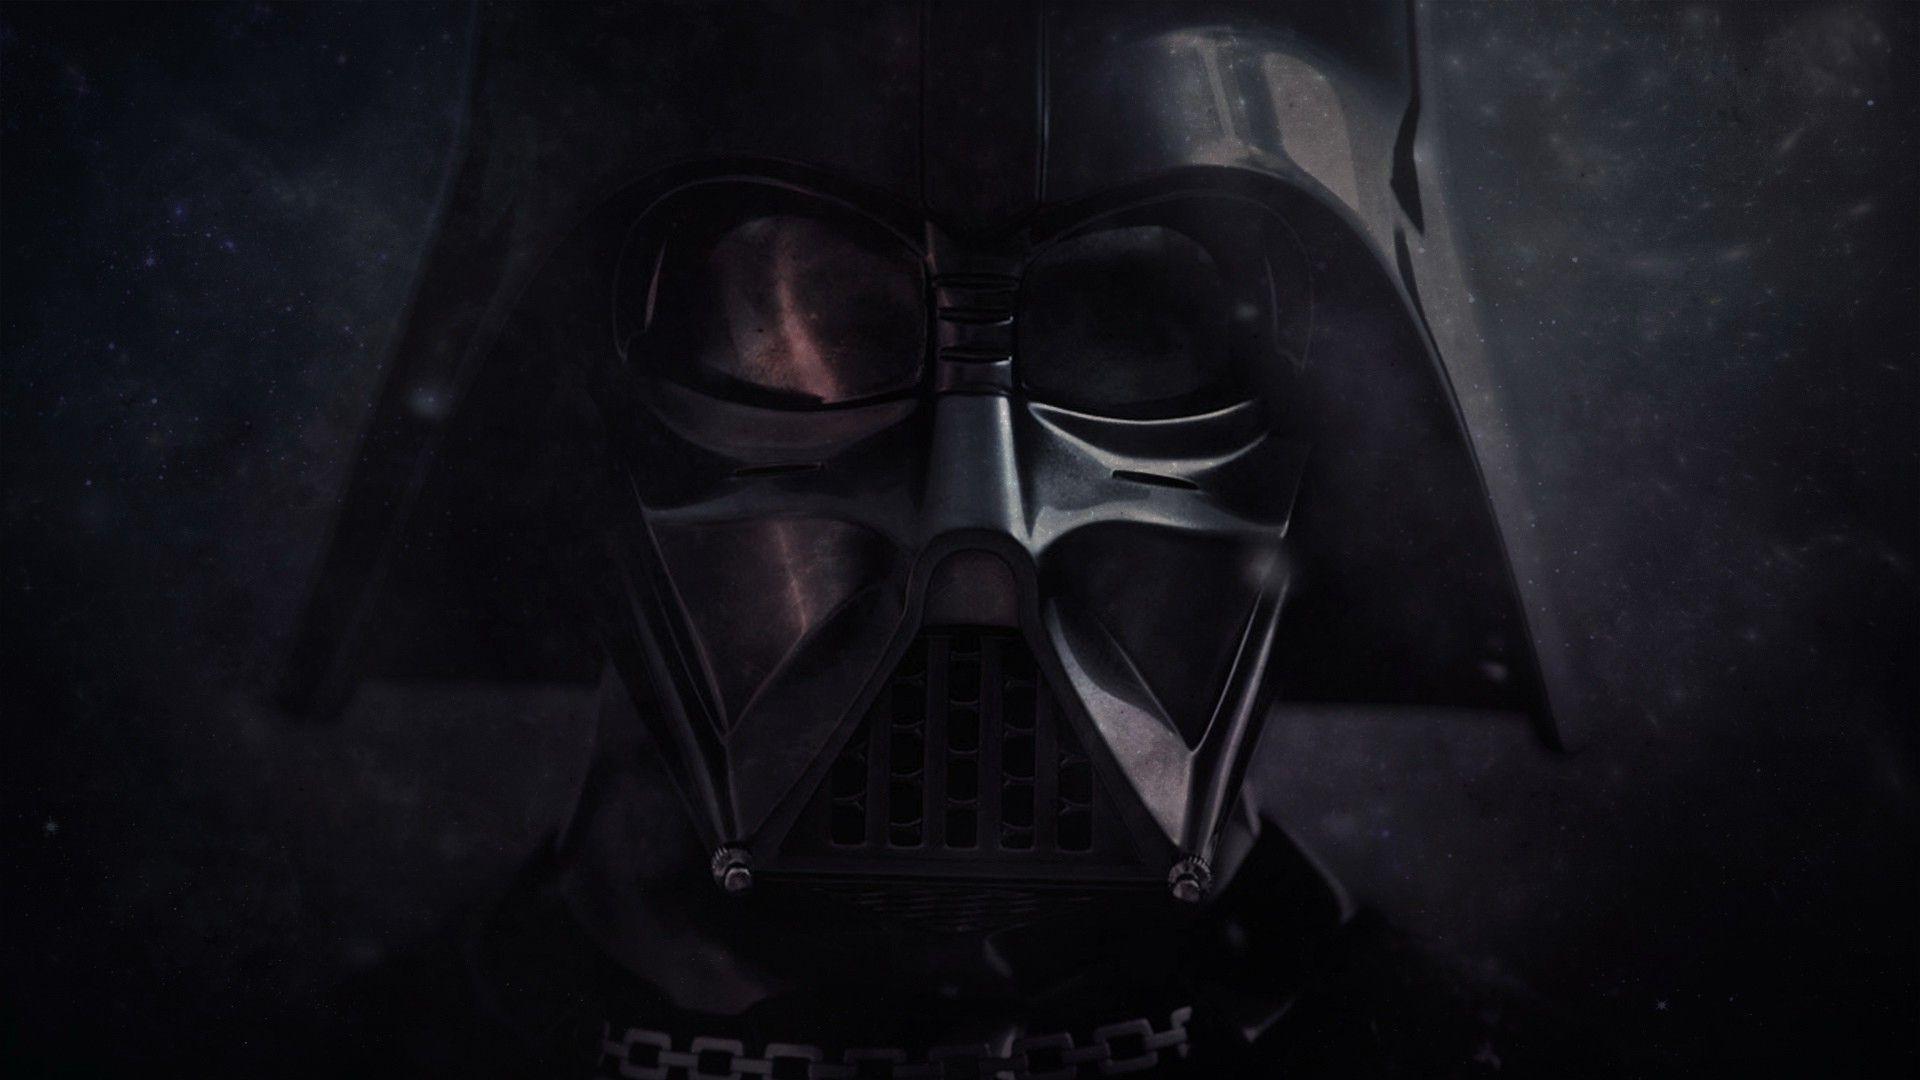 Darth Vader Live Wallpaper Android Apps on Google Play | HD Wallpapers |  Pinterest | Darth vader, Wallpaper and Wallpapers android